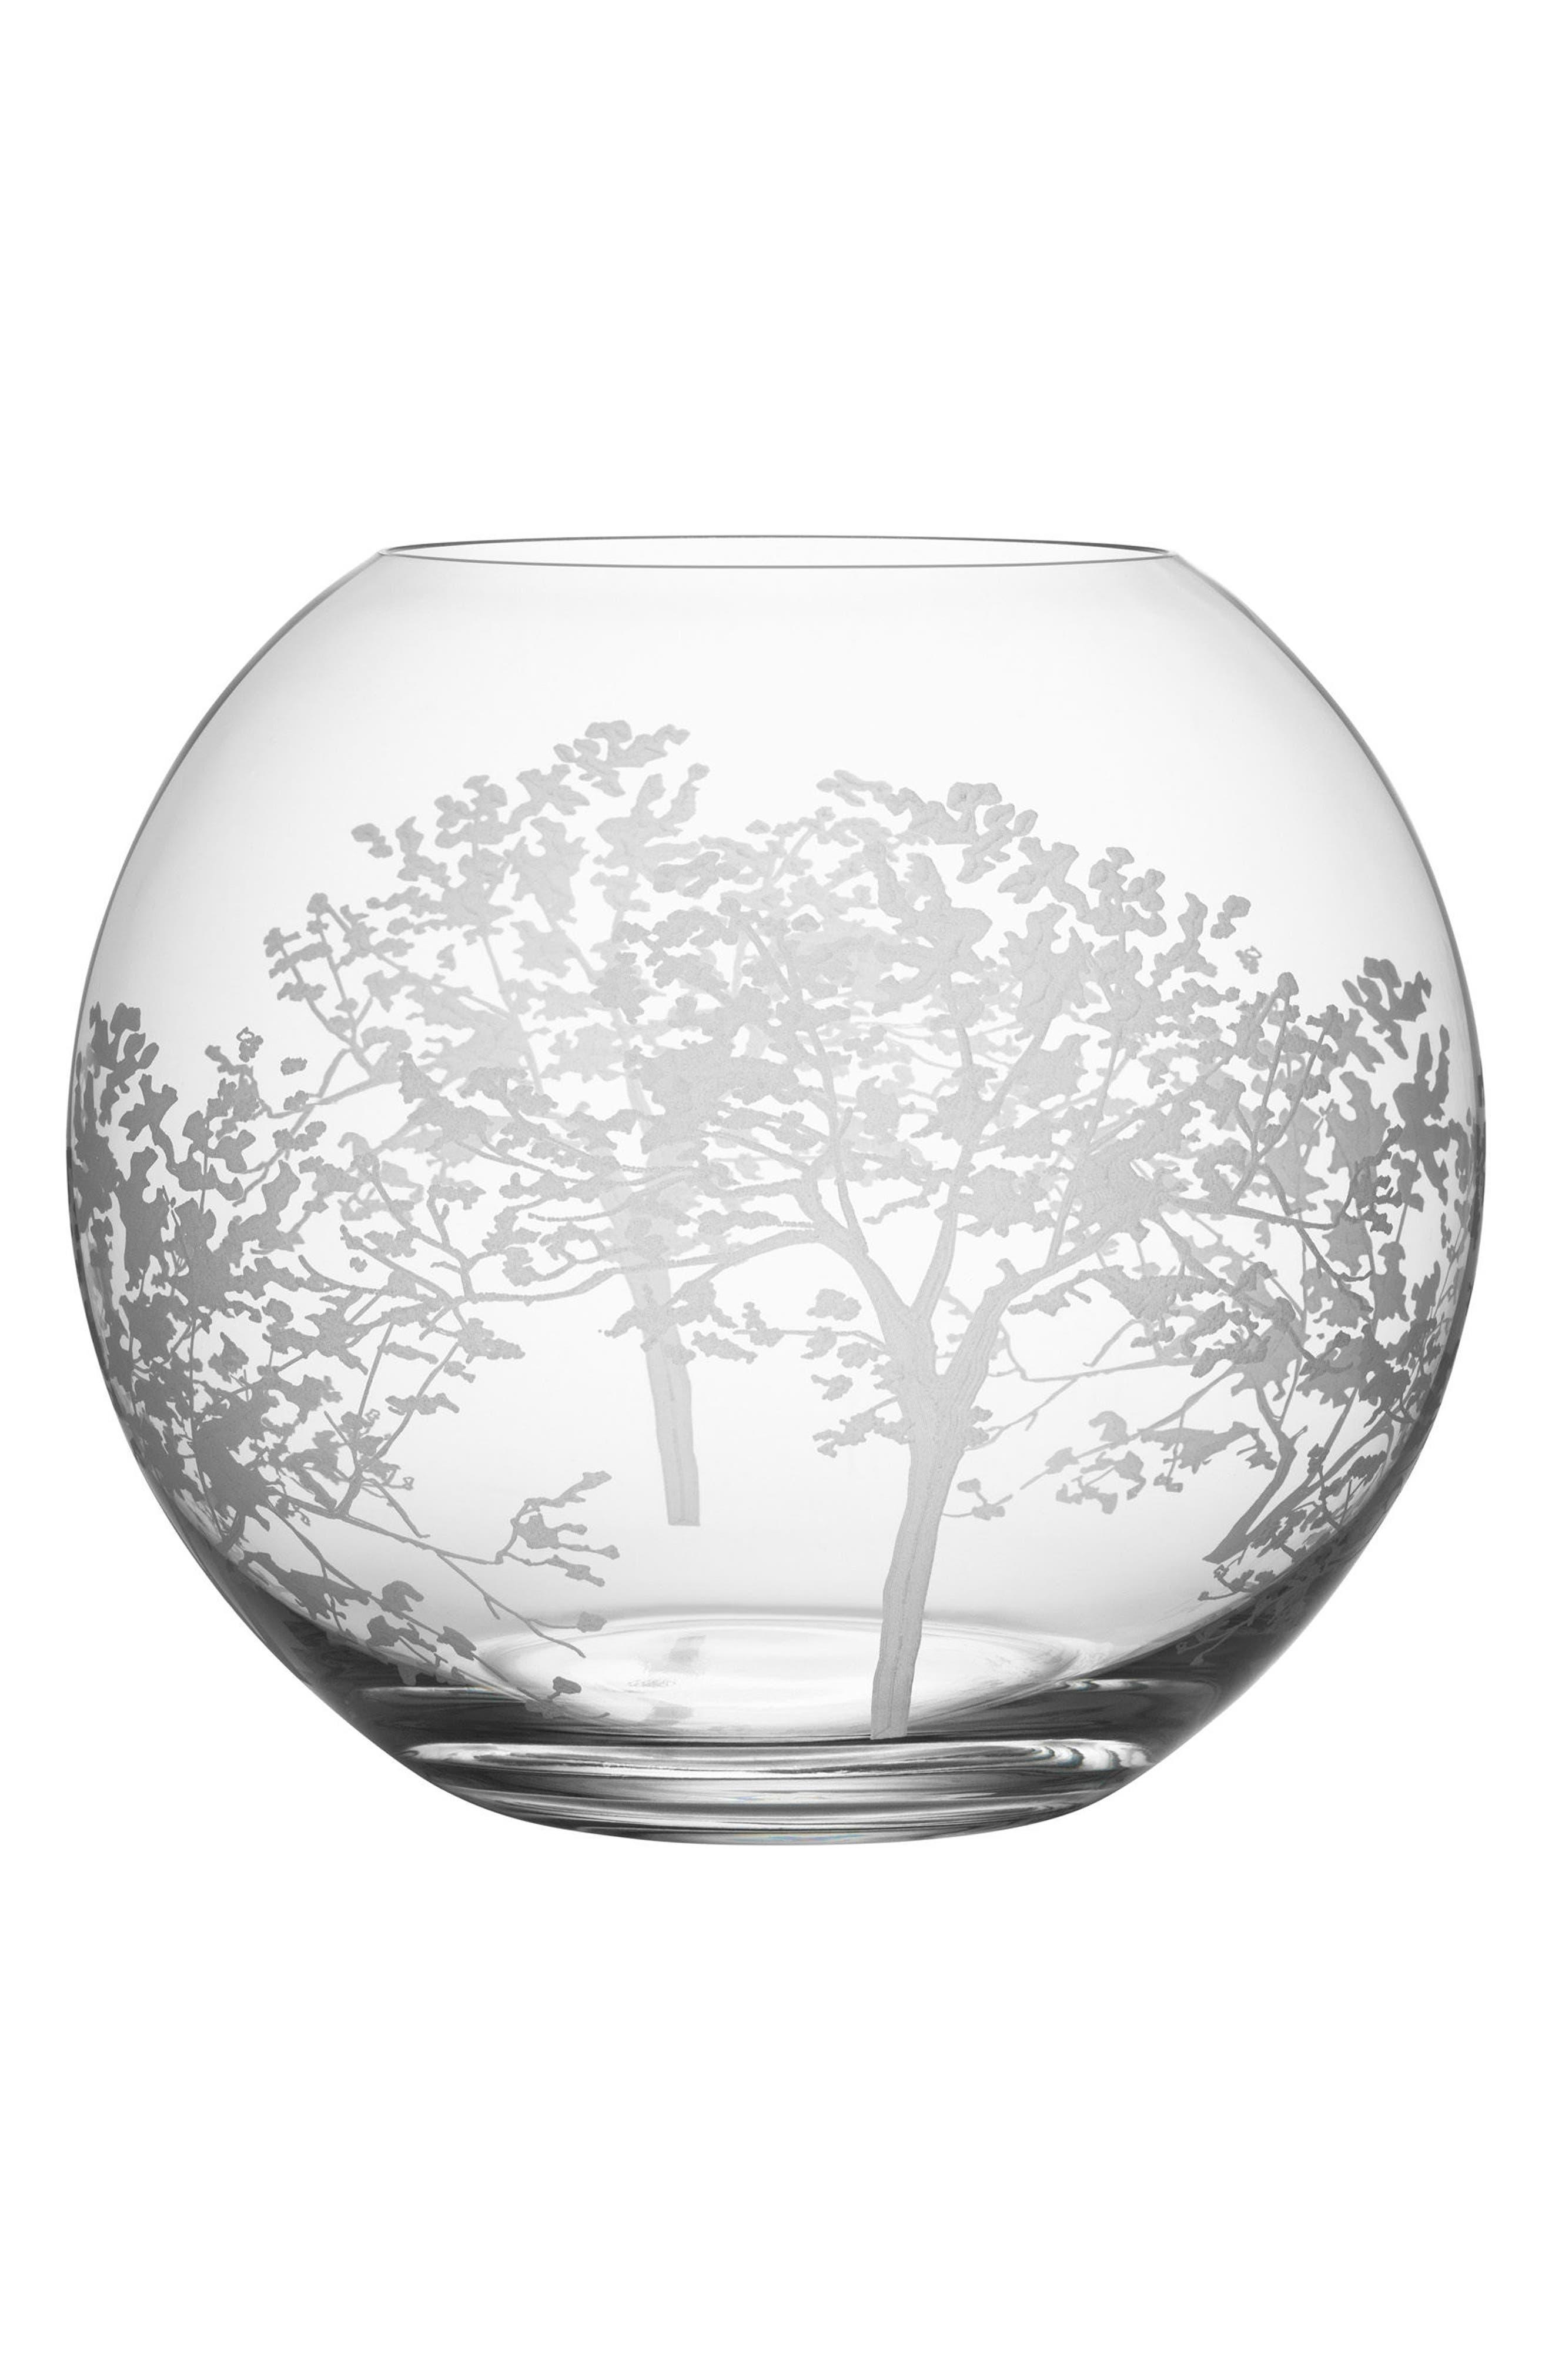 Organic Round Vase,                             Main thumbnail 1, color,                             100